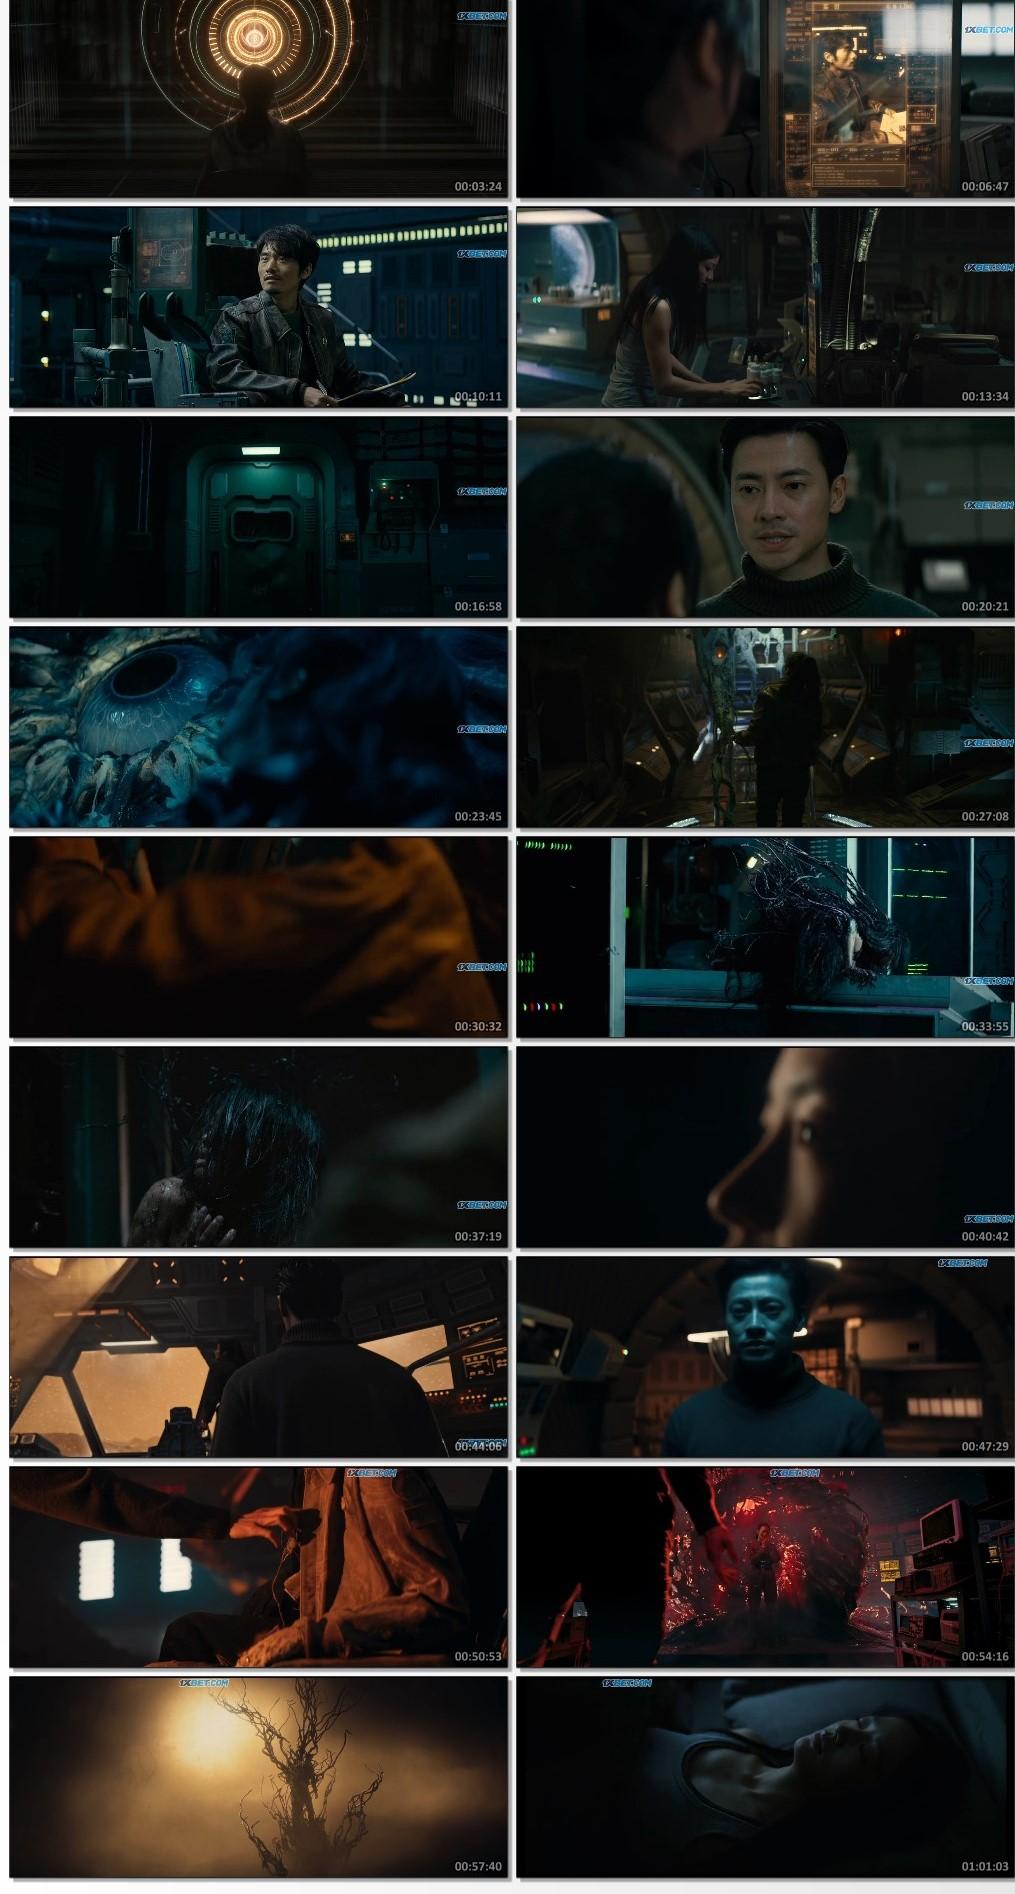 Invisible-Alien-2021-Hindi-Dubbed-HQ-720p-HDRip-500-MB-Download-www-7-Star-HD-wales-mkv-thumbs0266df